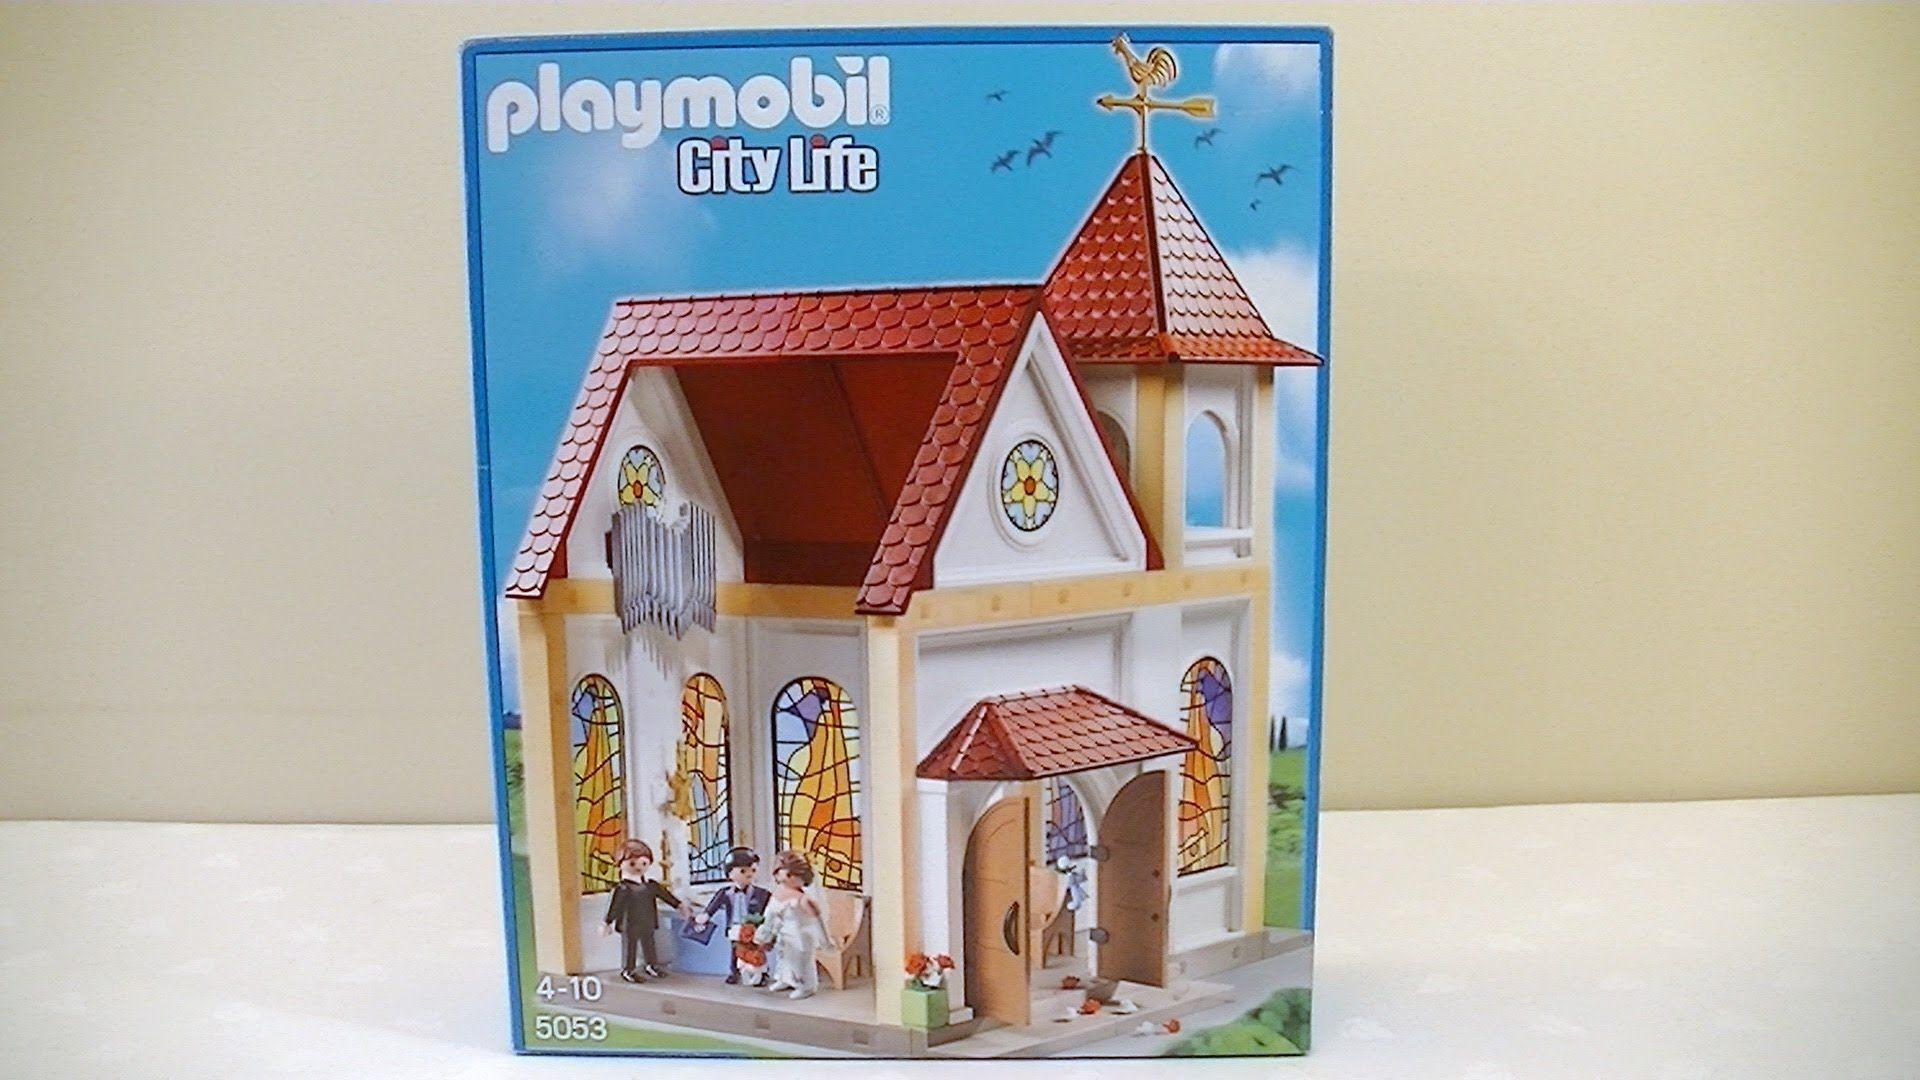 Playmobil 5053 City Life Wedding Church Assembly Review Christmas Display Playmobil City Life